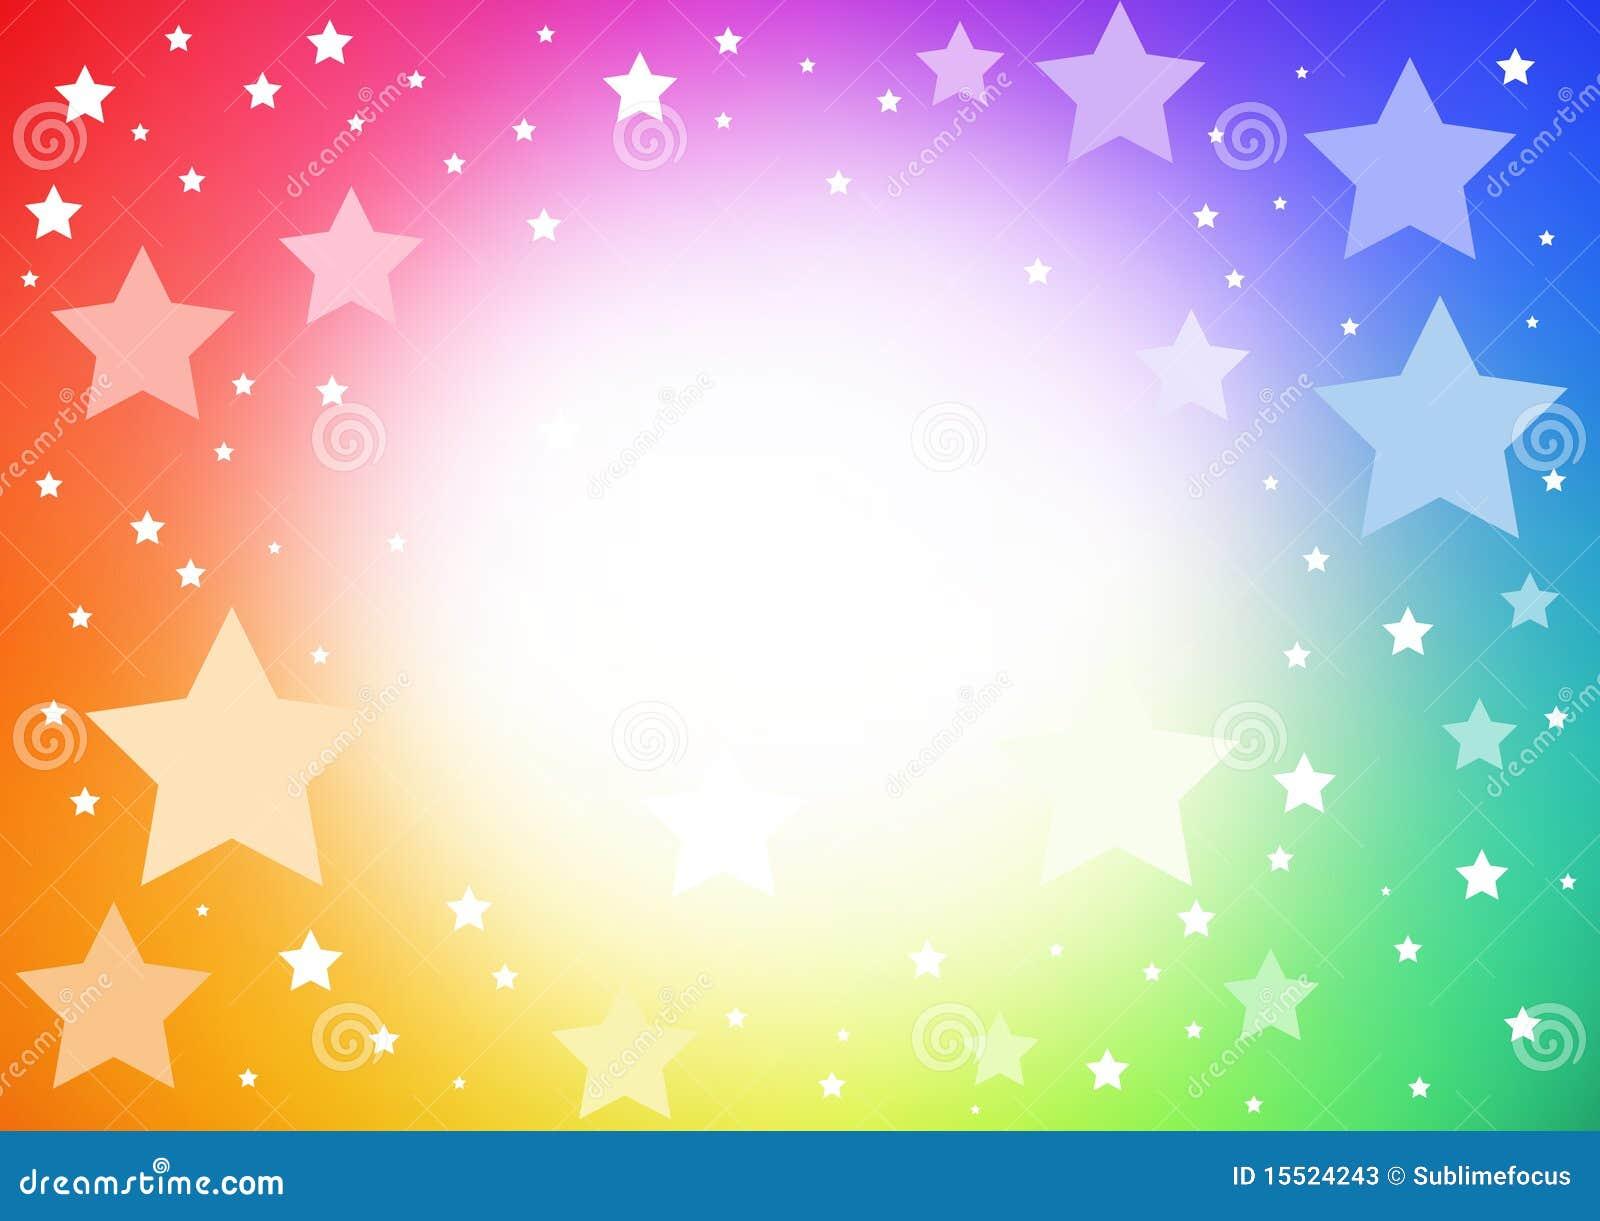 Bright Star Background Stock Photos - Image: 15524243